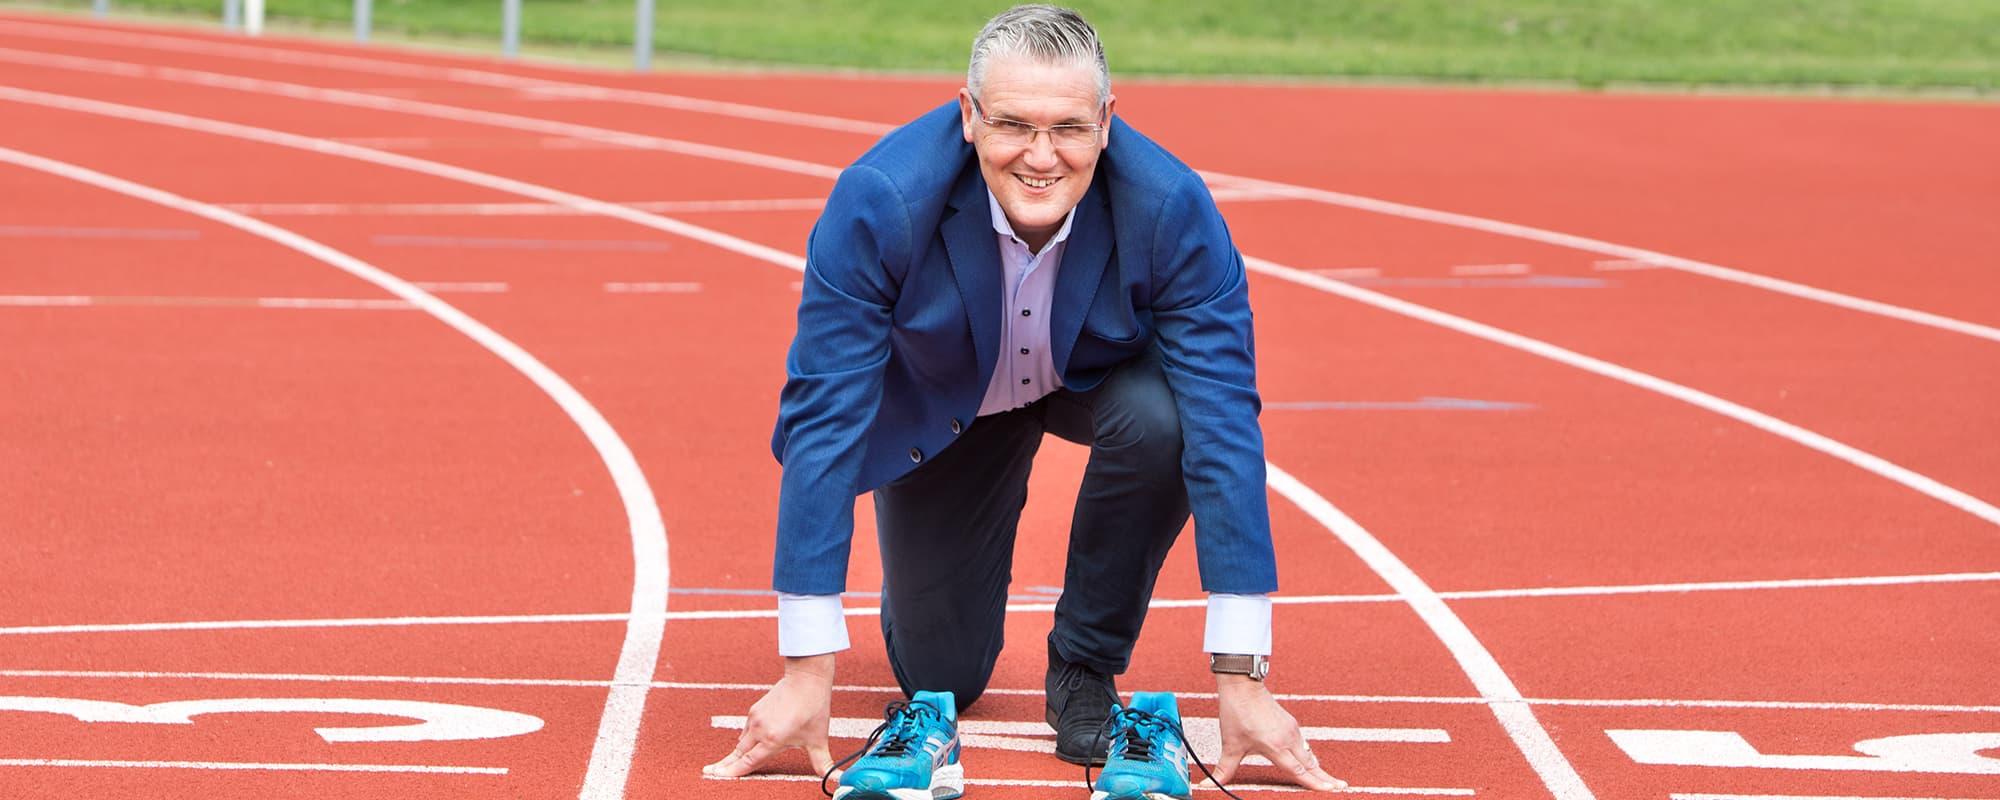 Krediet Coach | Gewoon Bij Westland Accountancy